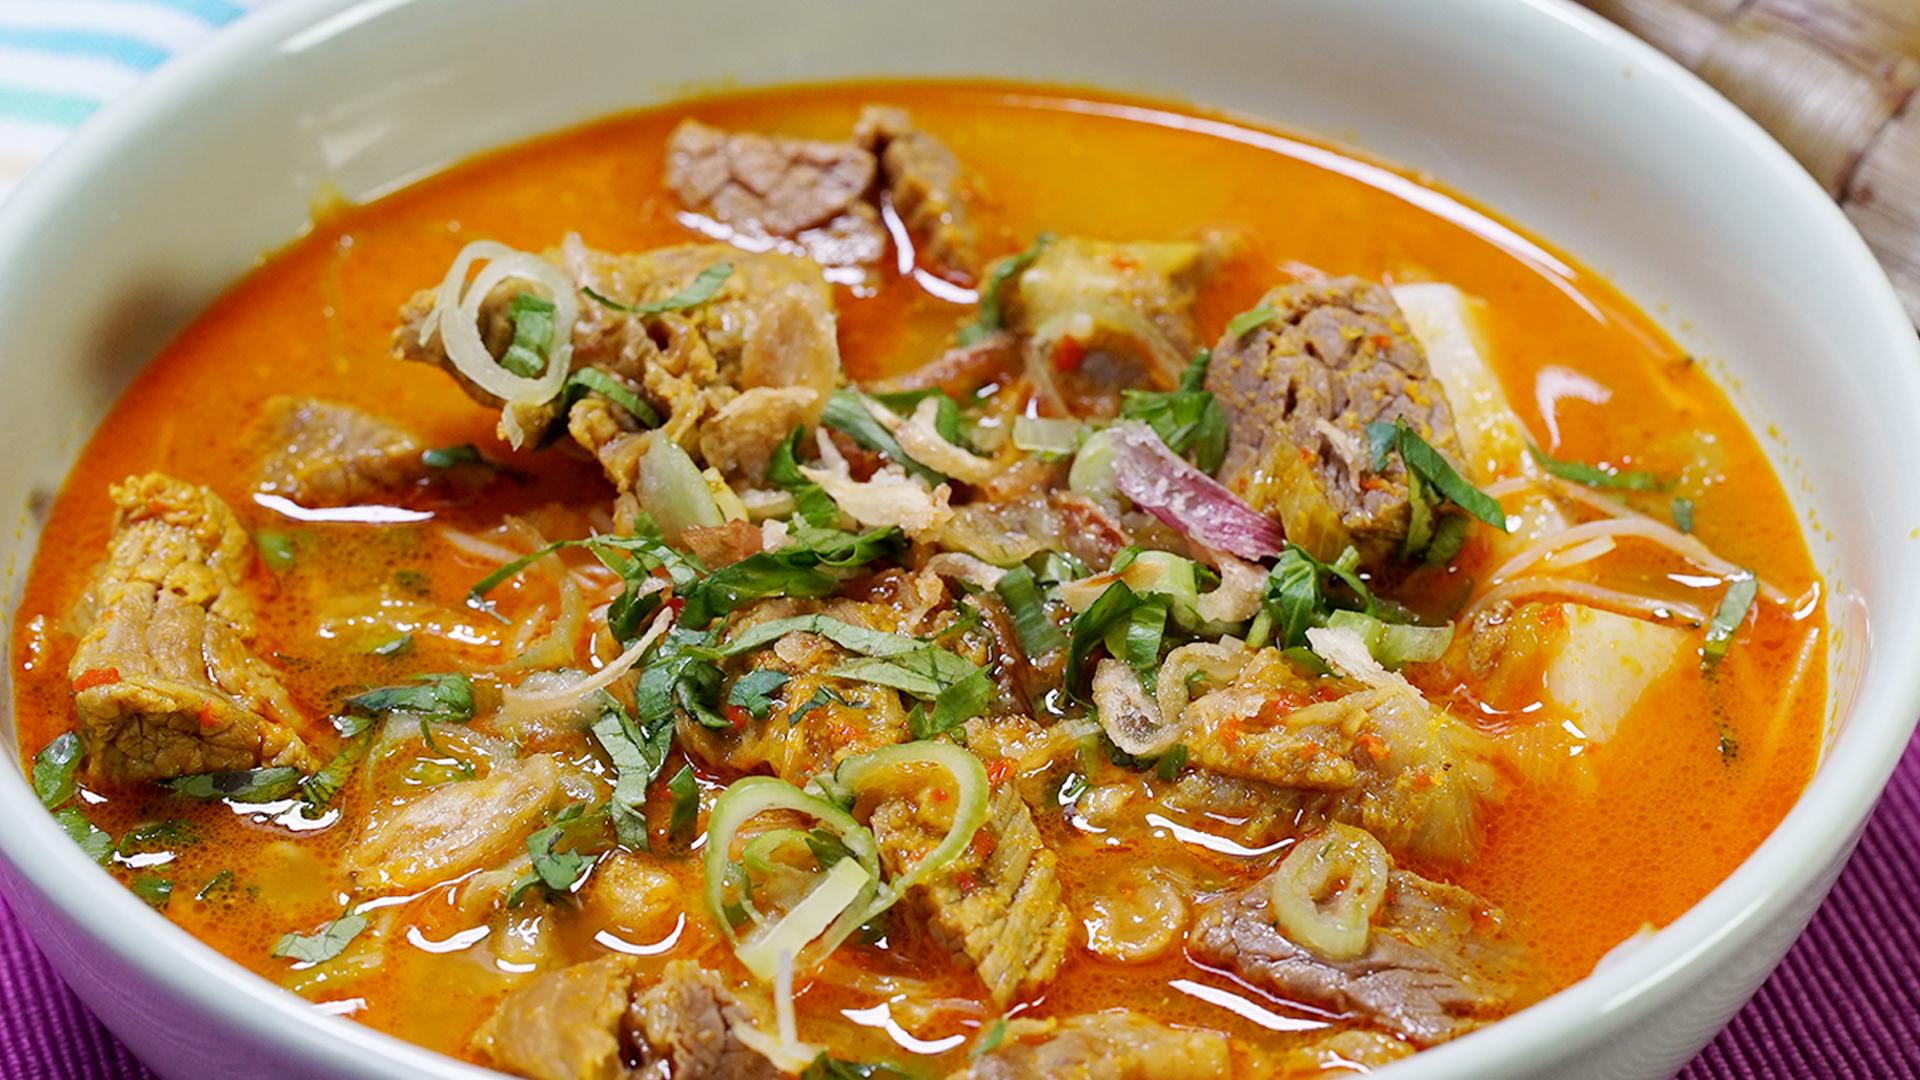 9 Wisata Kuliner Terlezat Pekalongan Yang Cocok Untuk Buka Puasa